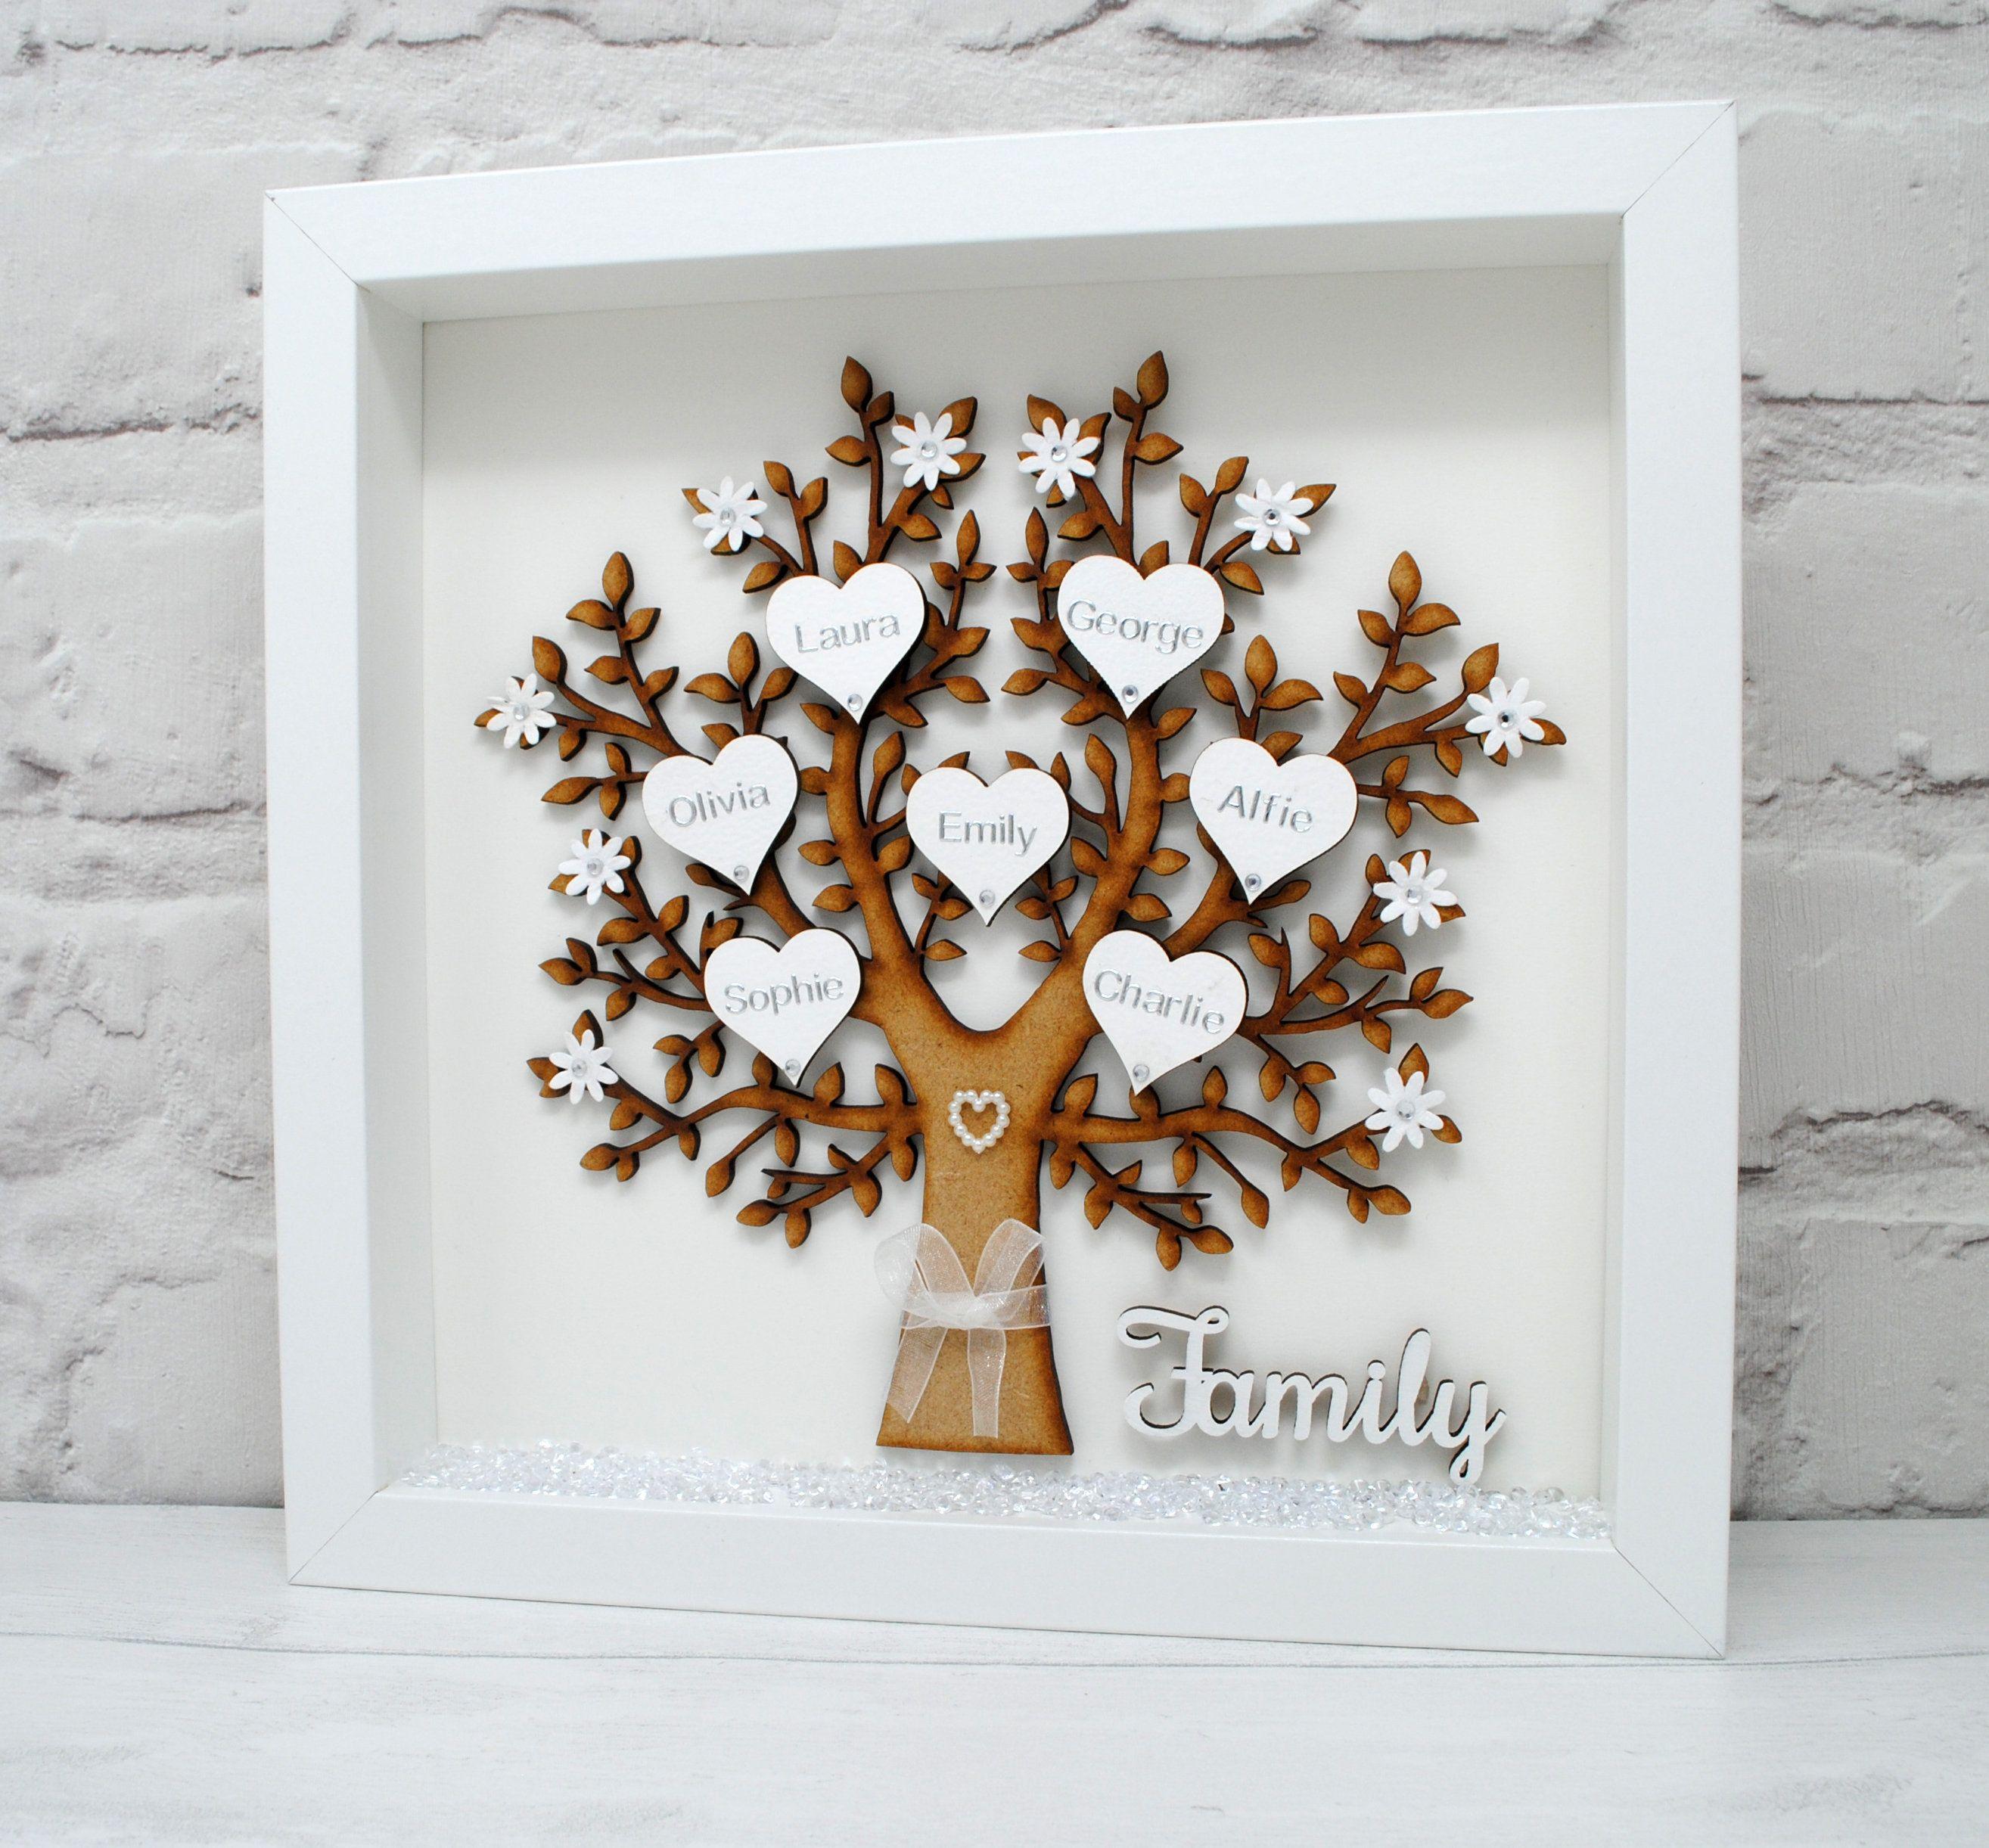 Personalised Family Tree Frame Family Names Keepsake Mum Gift Grandparents Gift Personalised Gi Family Tree Gift Personalised Family Tree Family Tree Frame